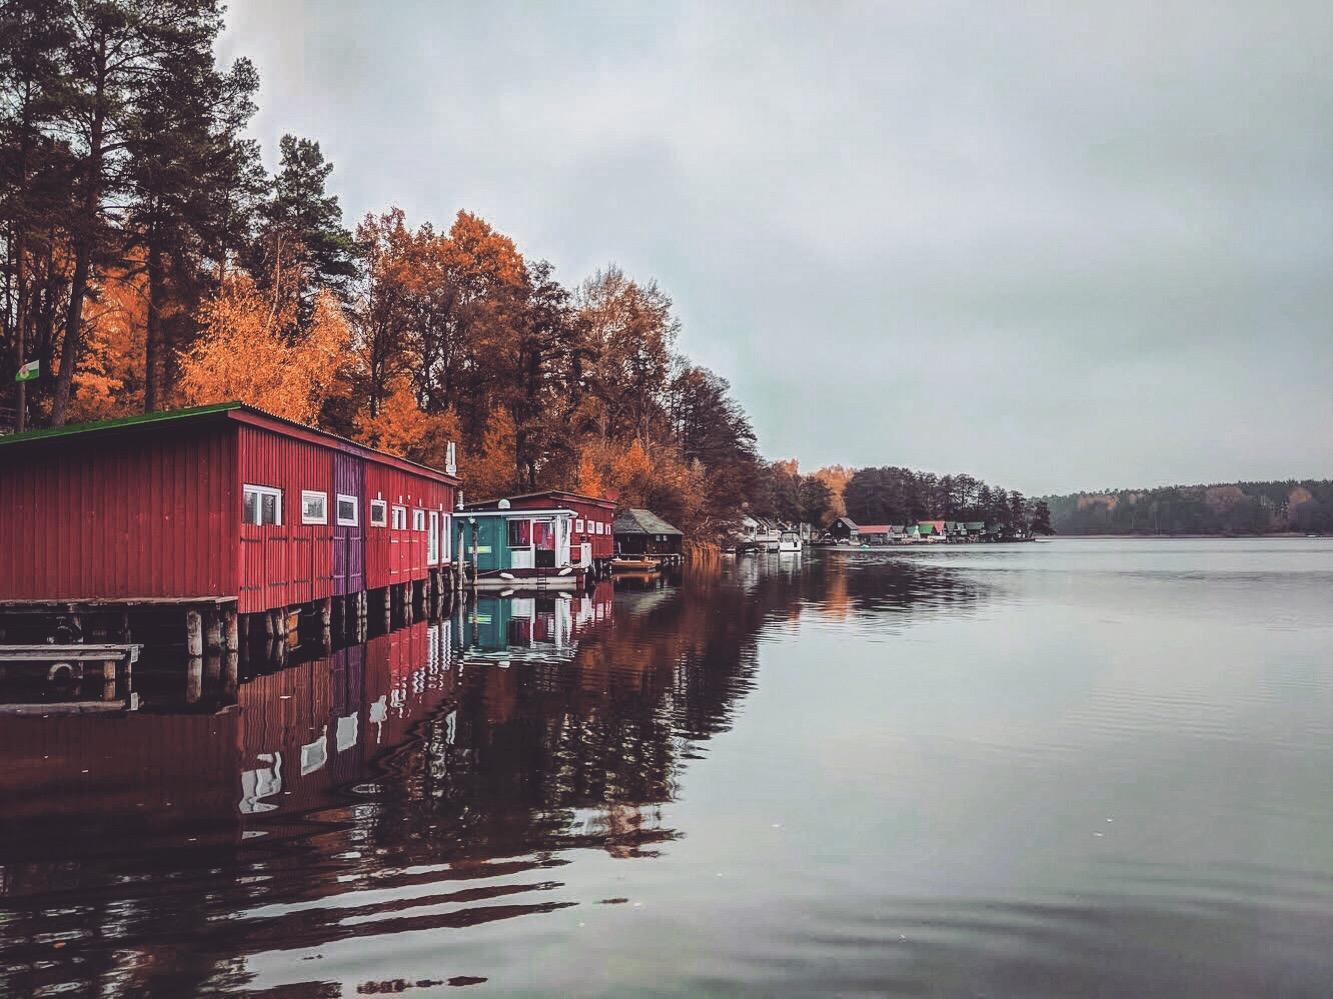 Bootshäuser am See